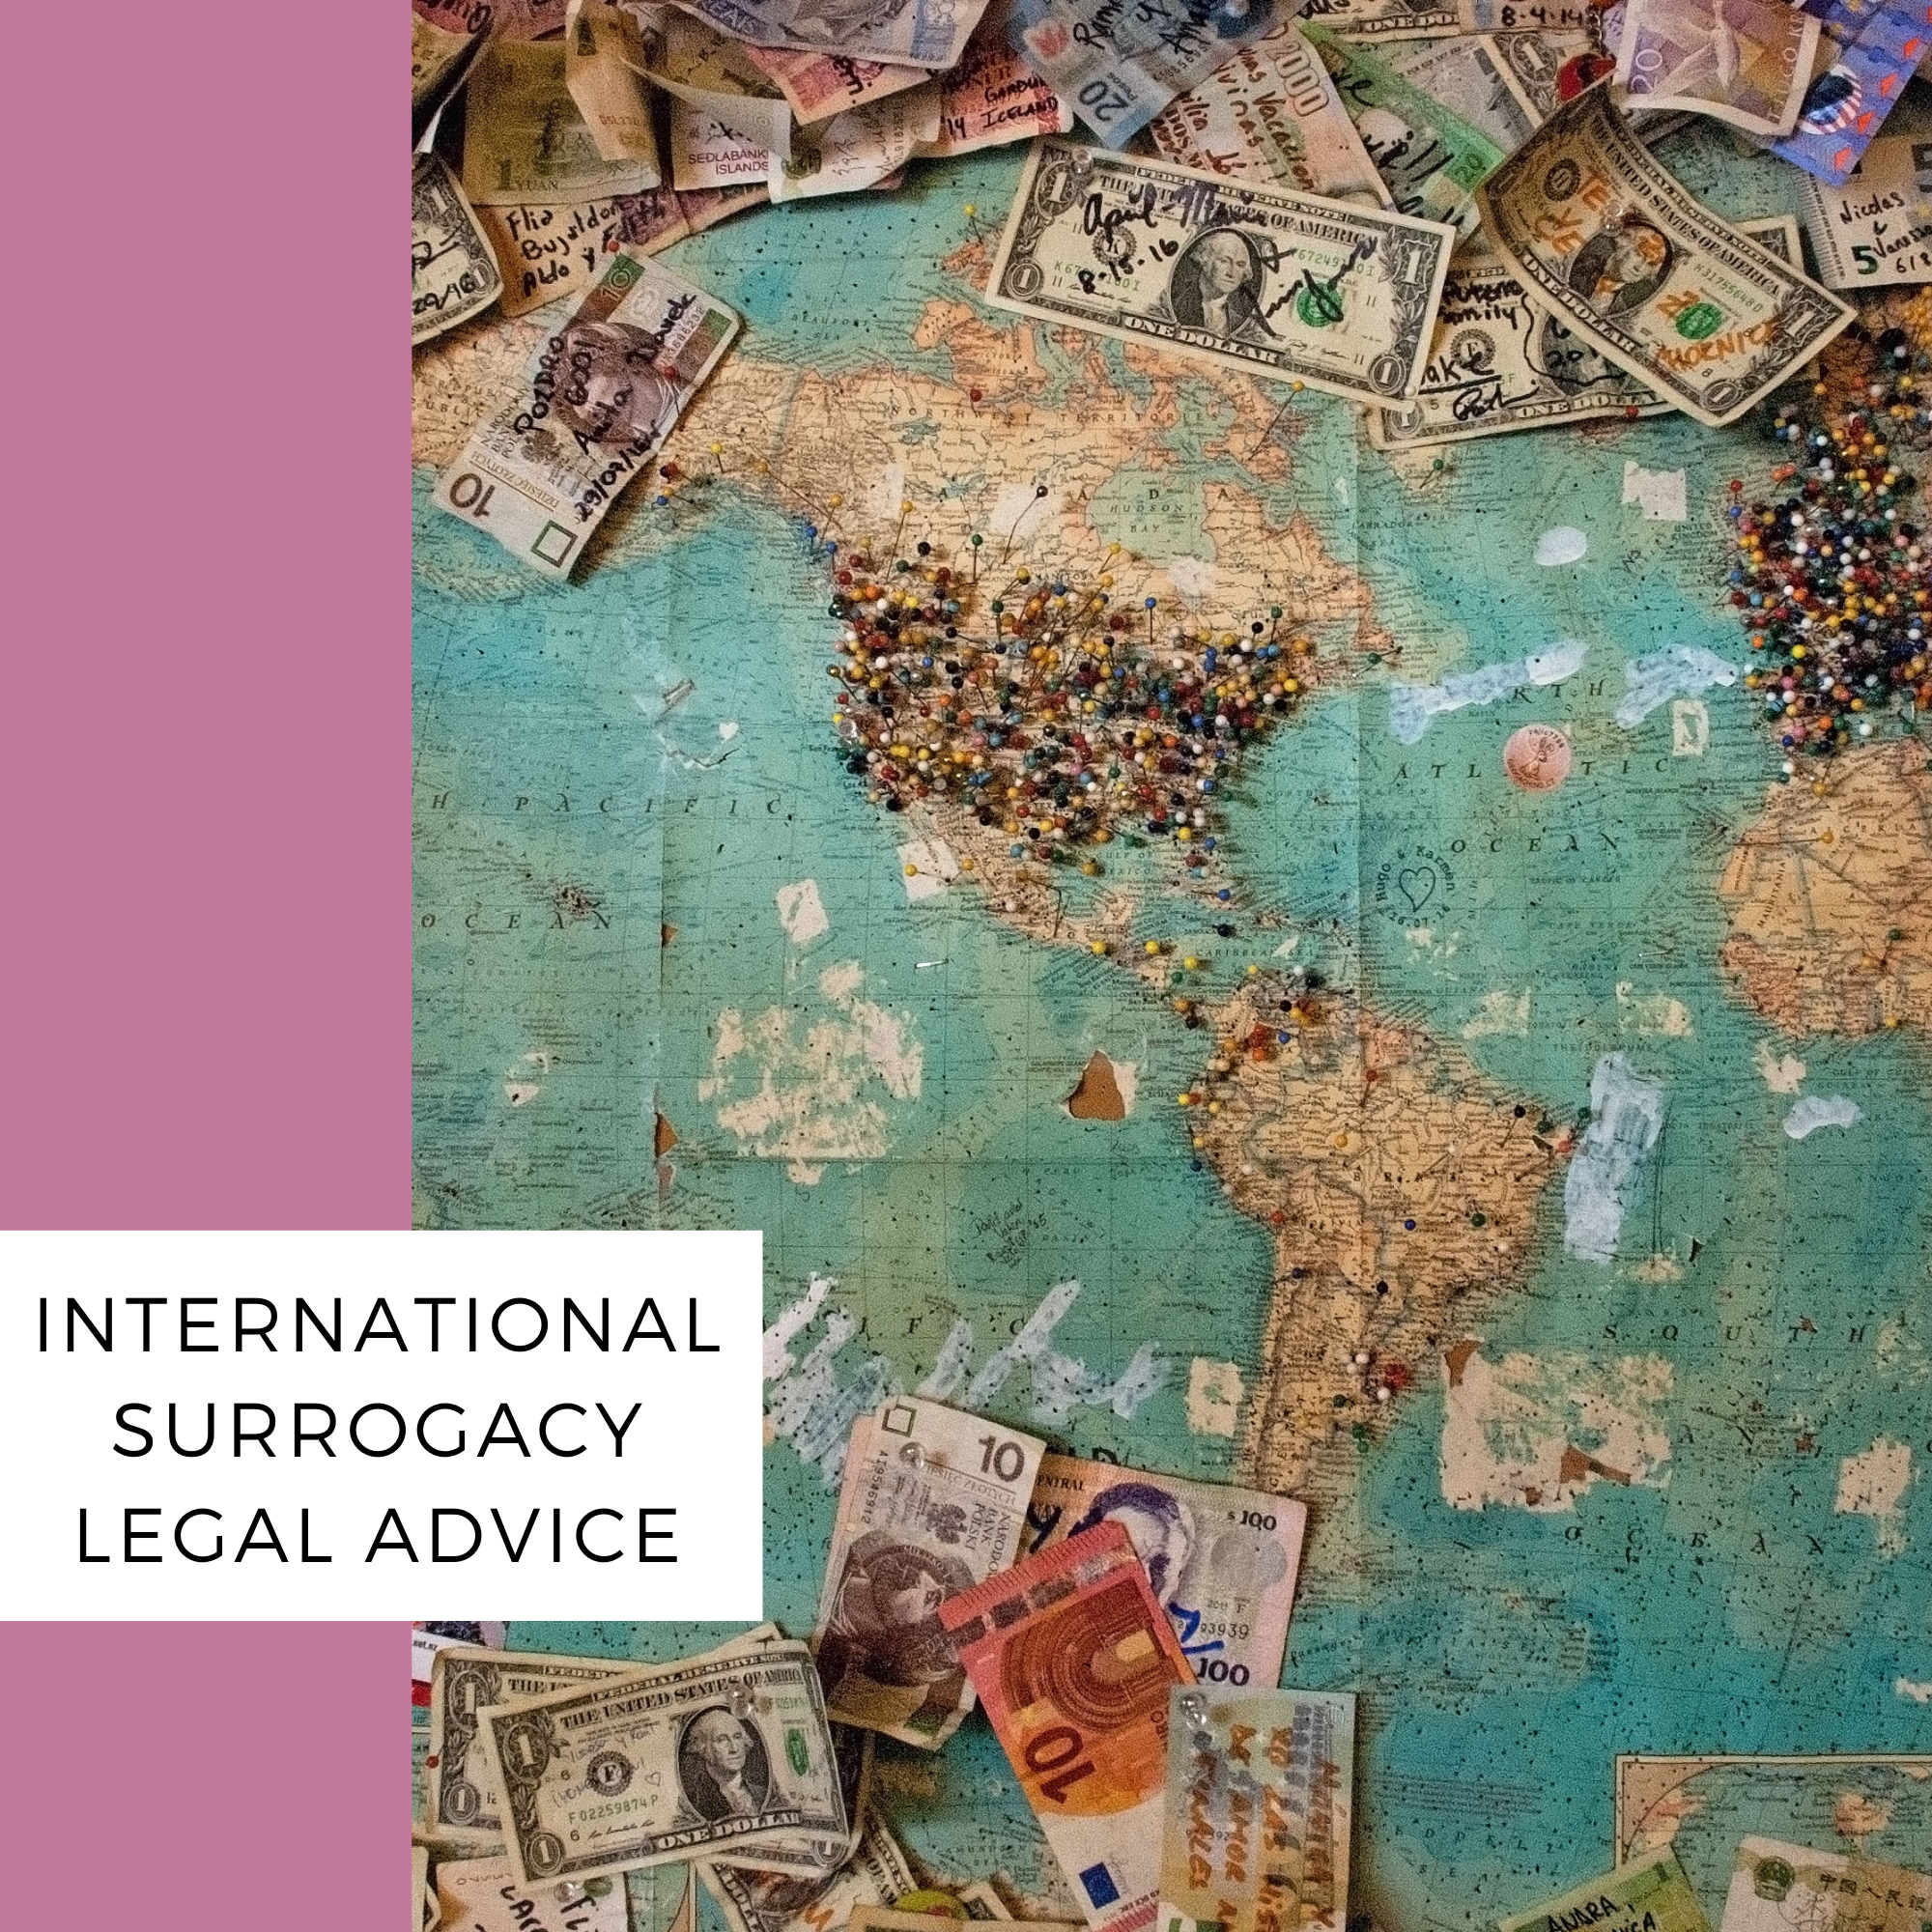 international surrogacy legal advice